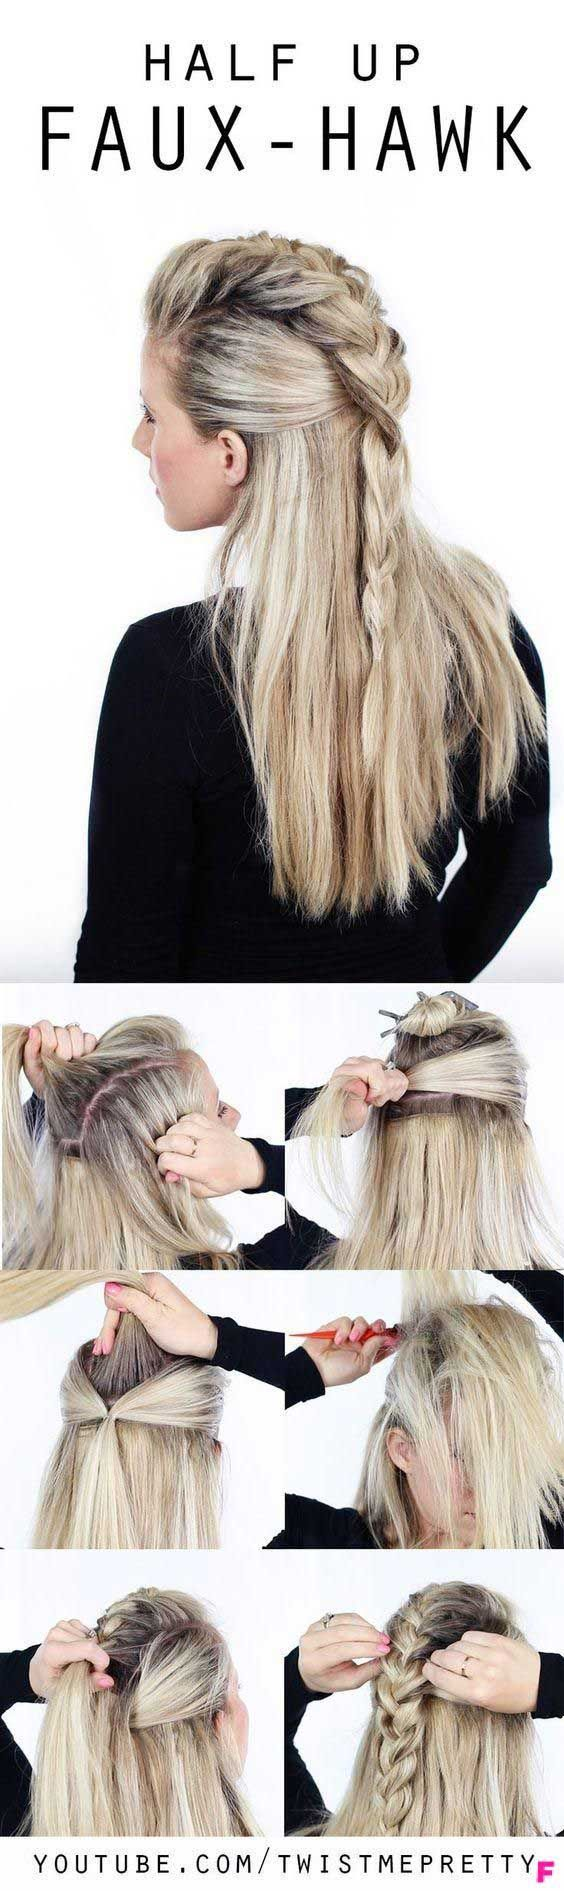 best 25+ lazy day hairstyles ideas on pinterest | lazy hair, lazy